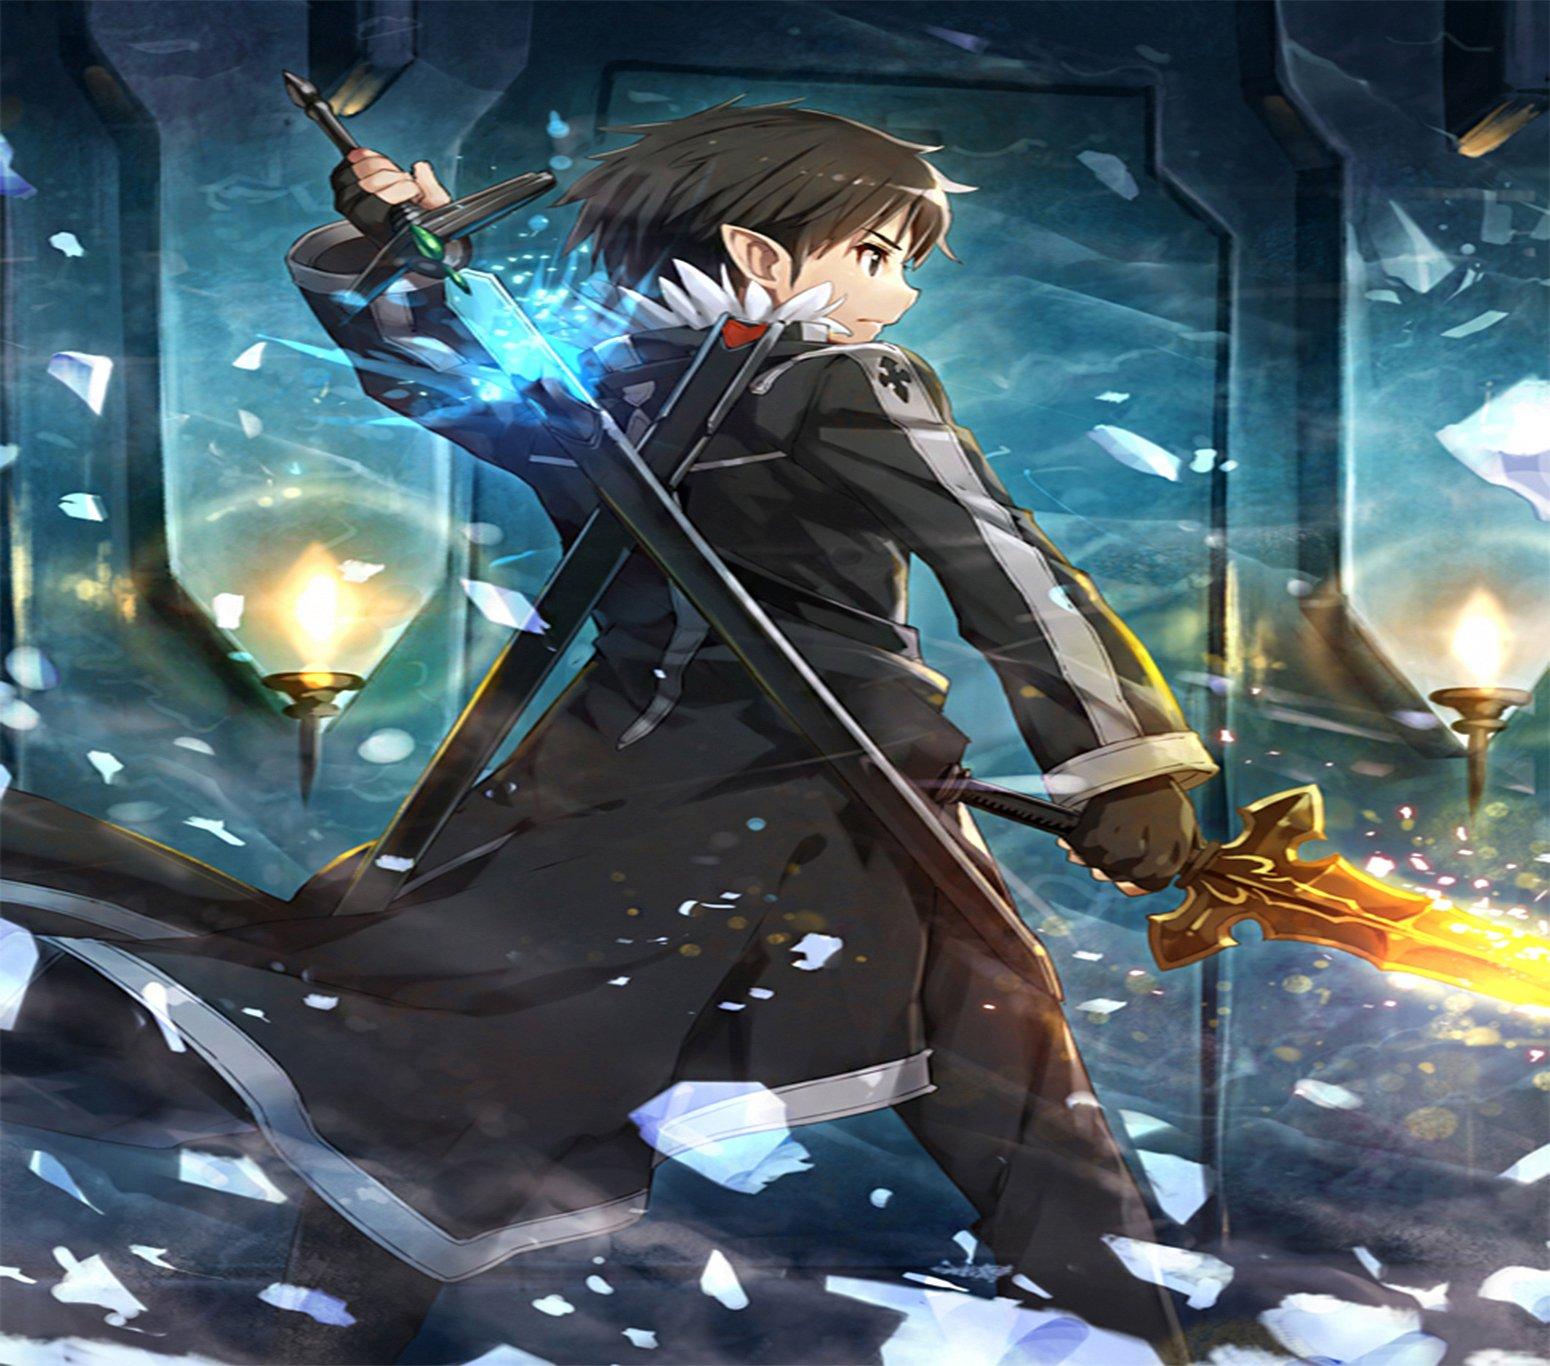 Online Wallpaper: Kirito Wallpaper And Background Image